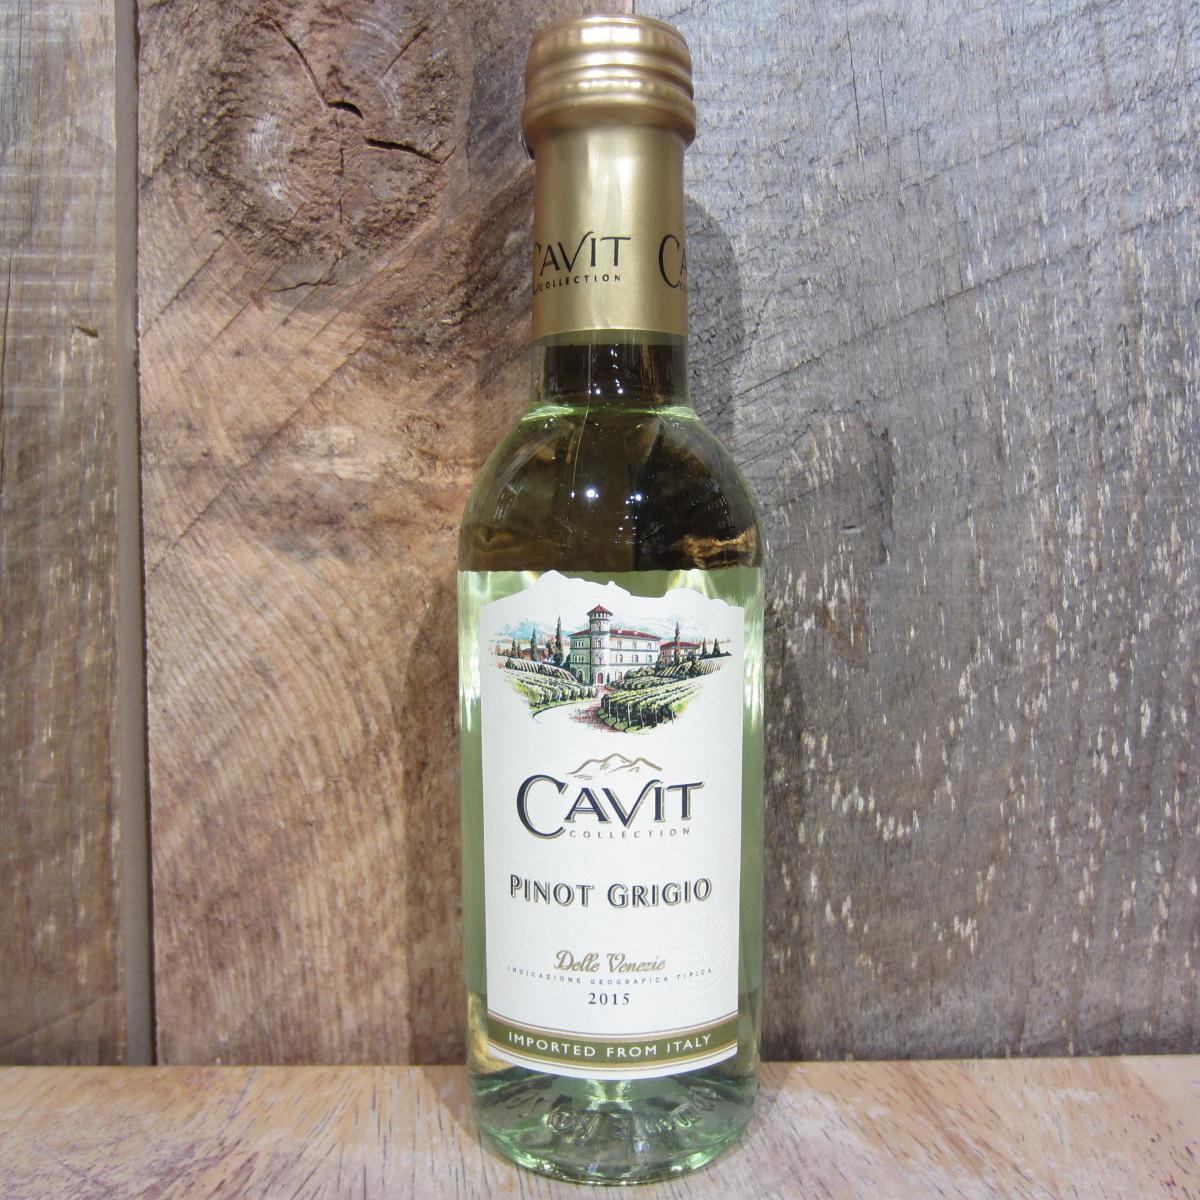 Cavit Pinot Grigio 187ml (Quarter Btl)